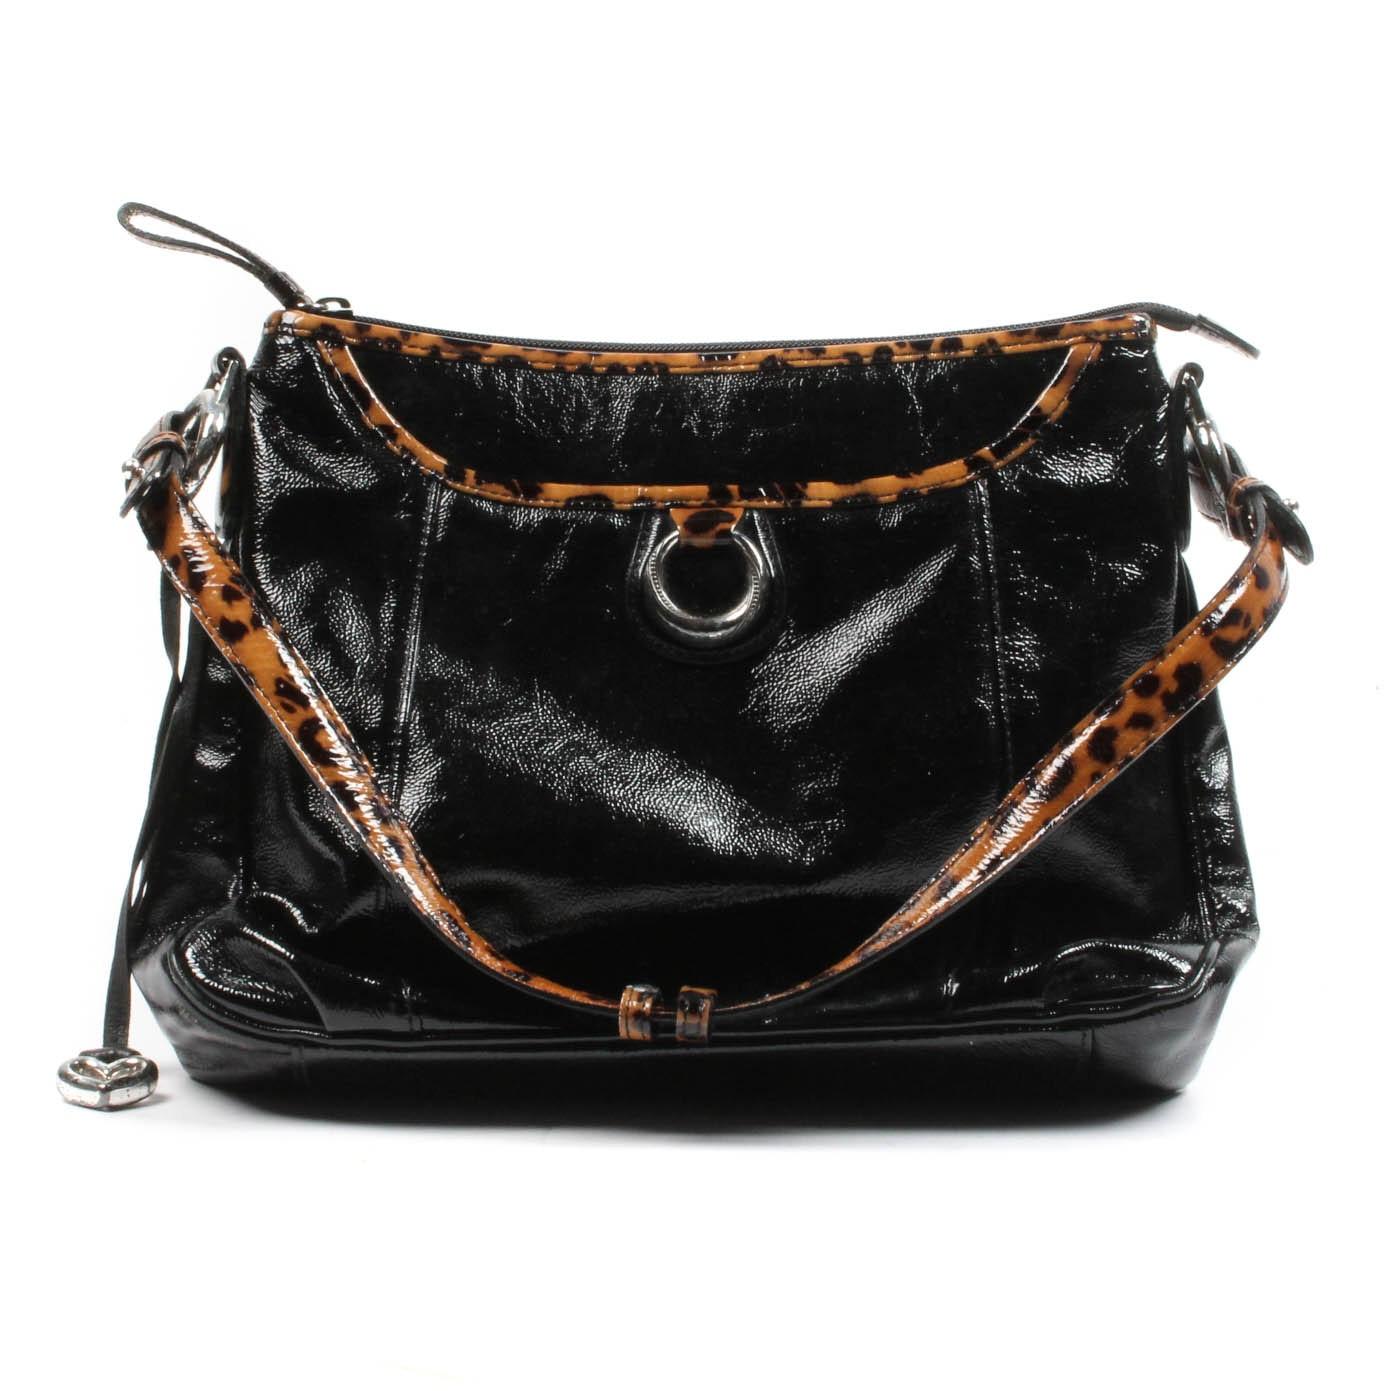 Brighton Patent Leather Shoulder bag